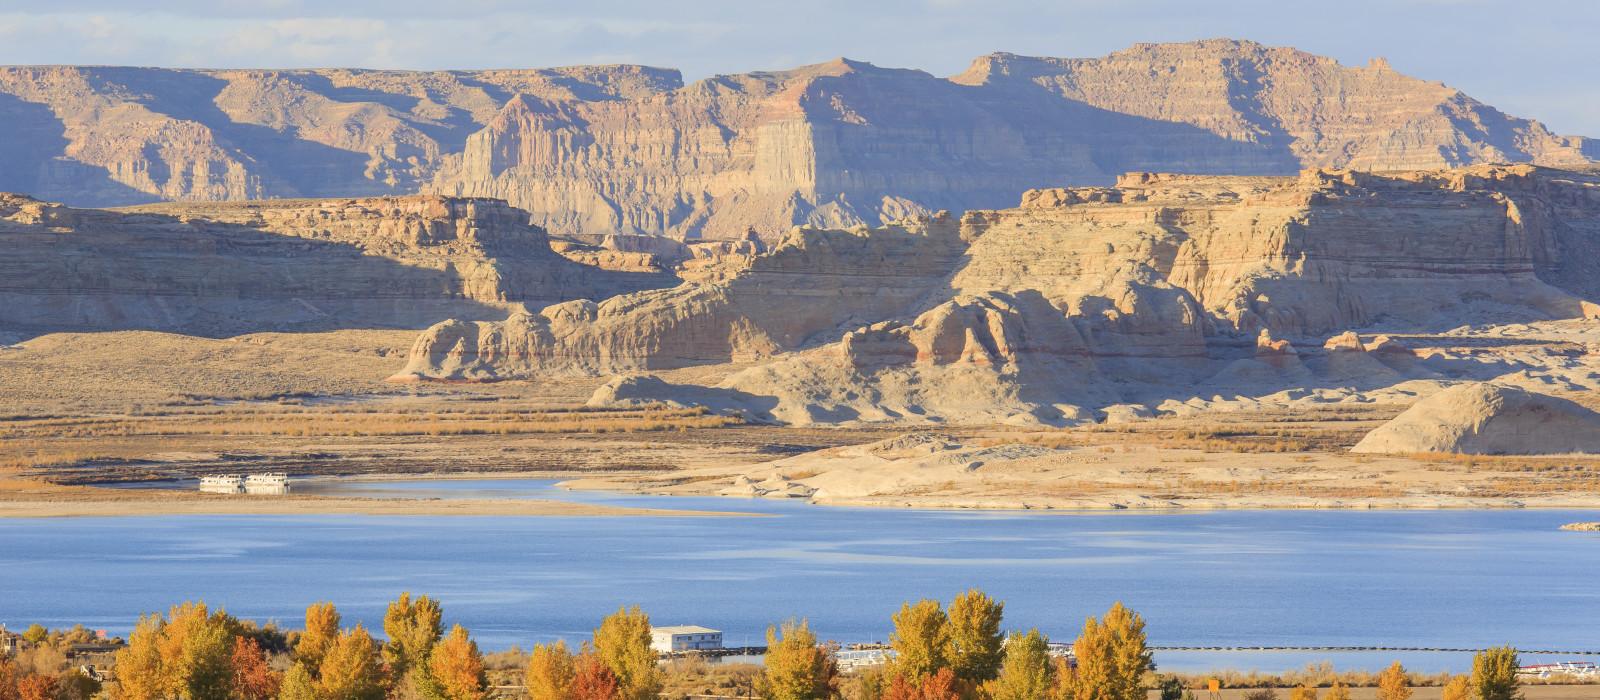 Reiseziel Page, Arizona USA